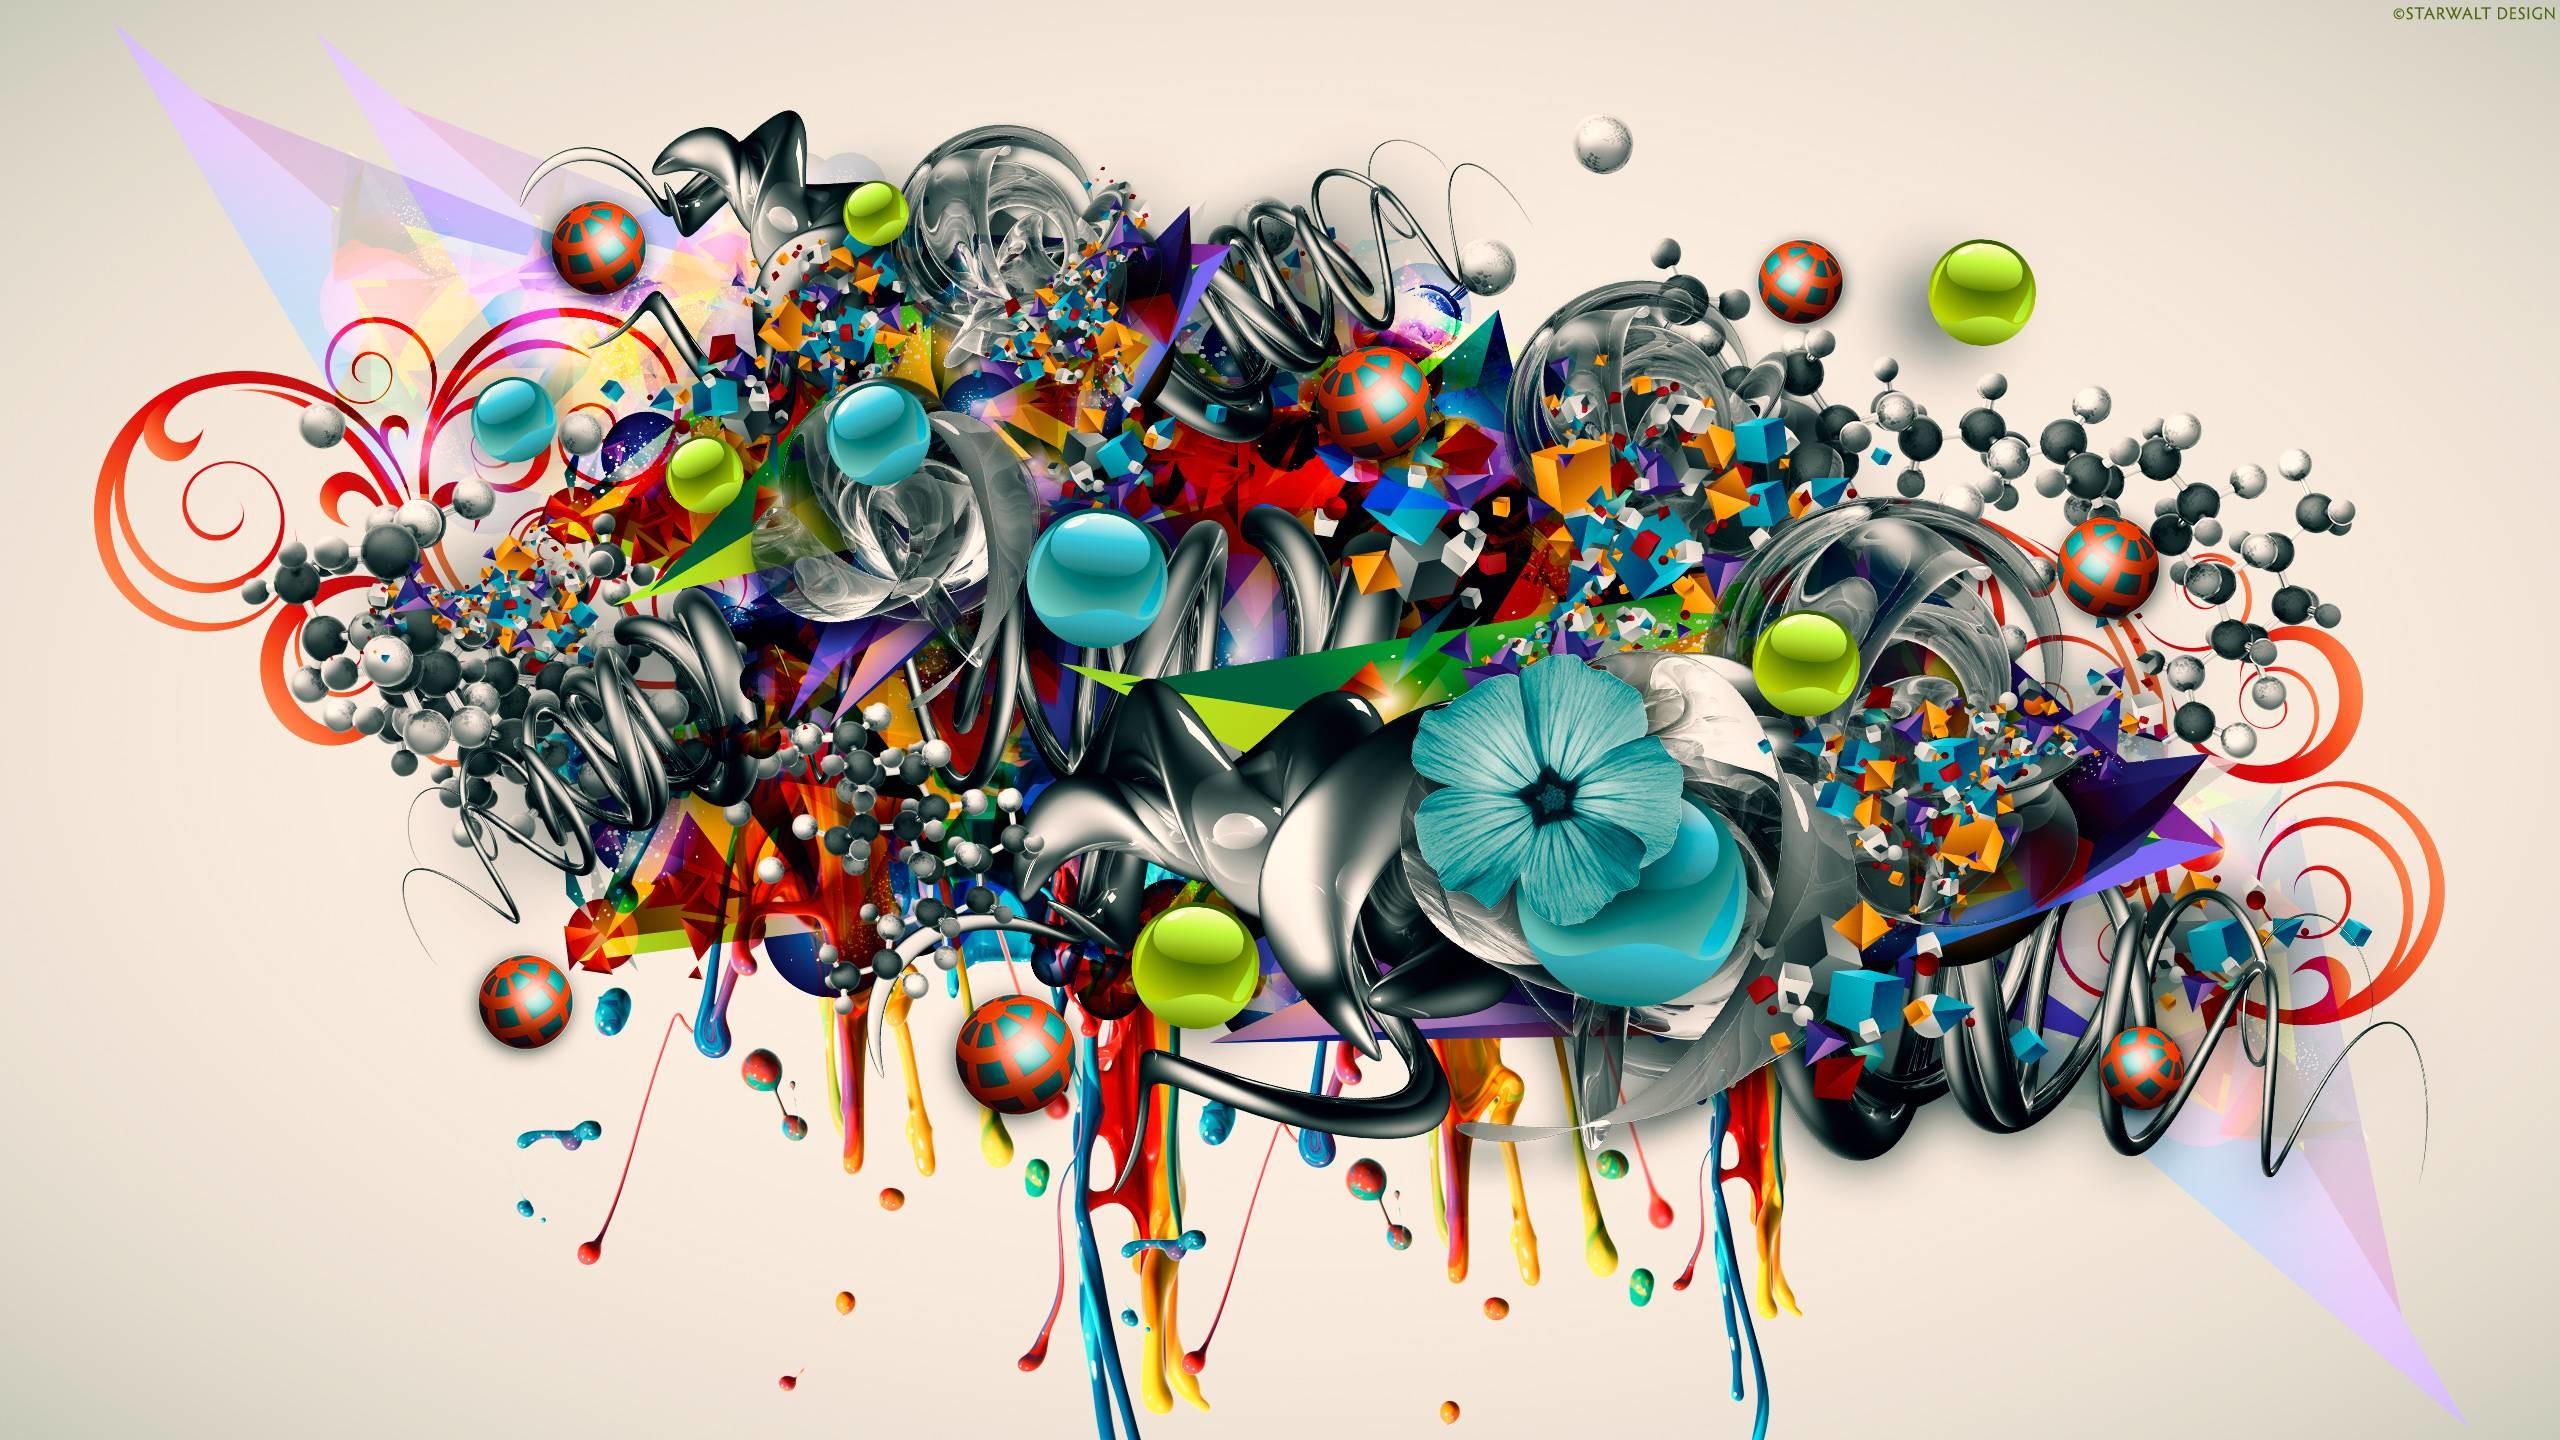 Hd Graffiti Wallpaper Wallpapertag